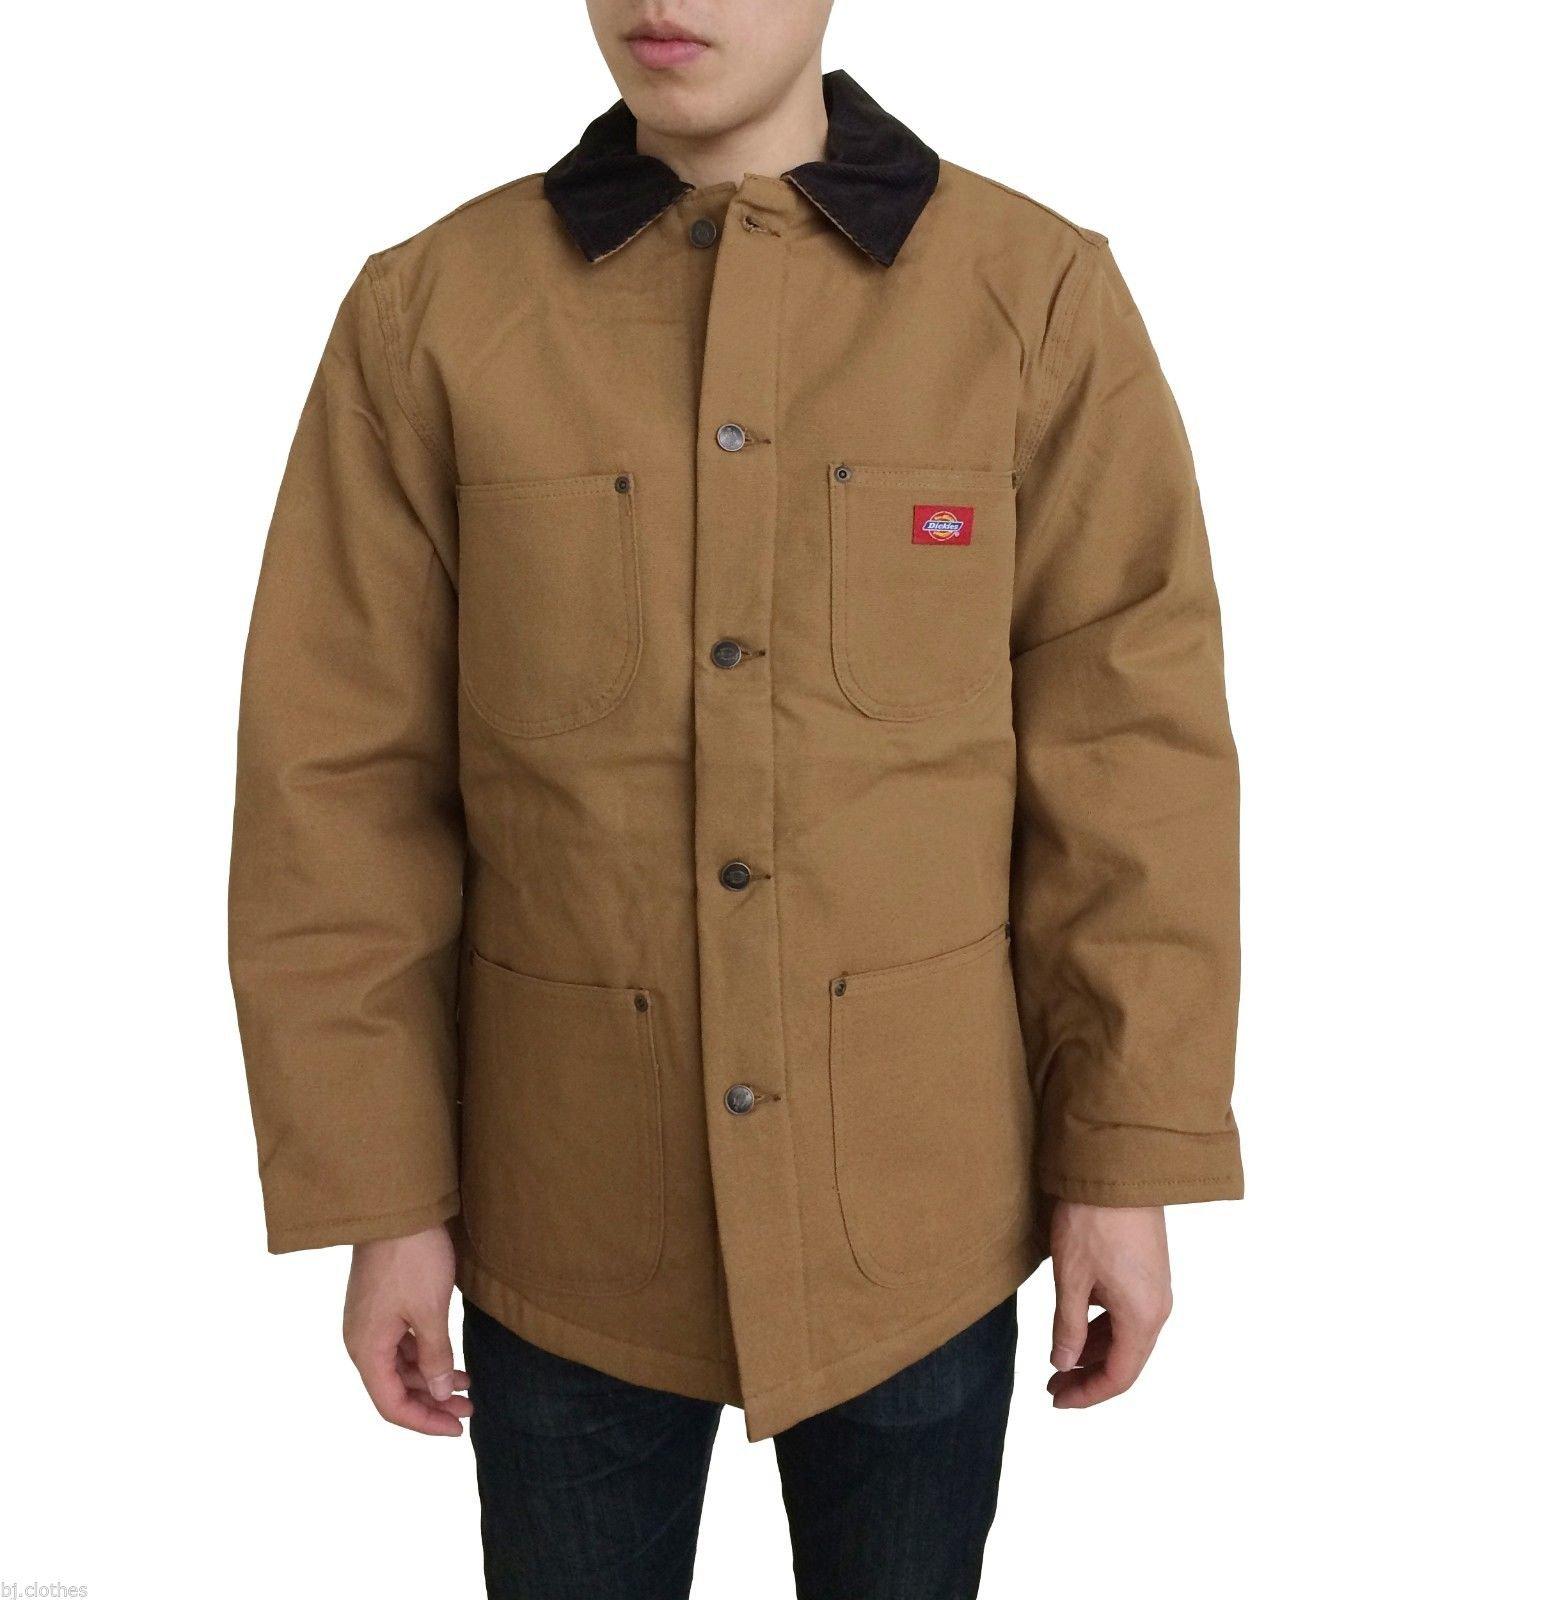 Dickies Men's 3439 Blanket Lined Chore Coat Jacket (2XL, Duck Brown)